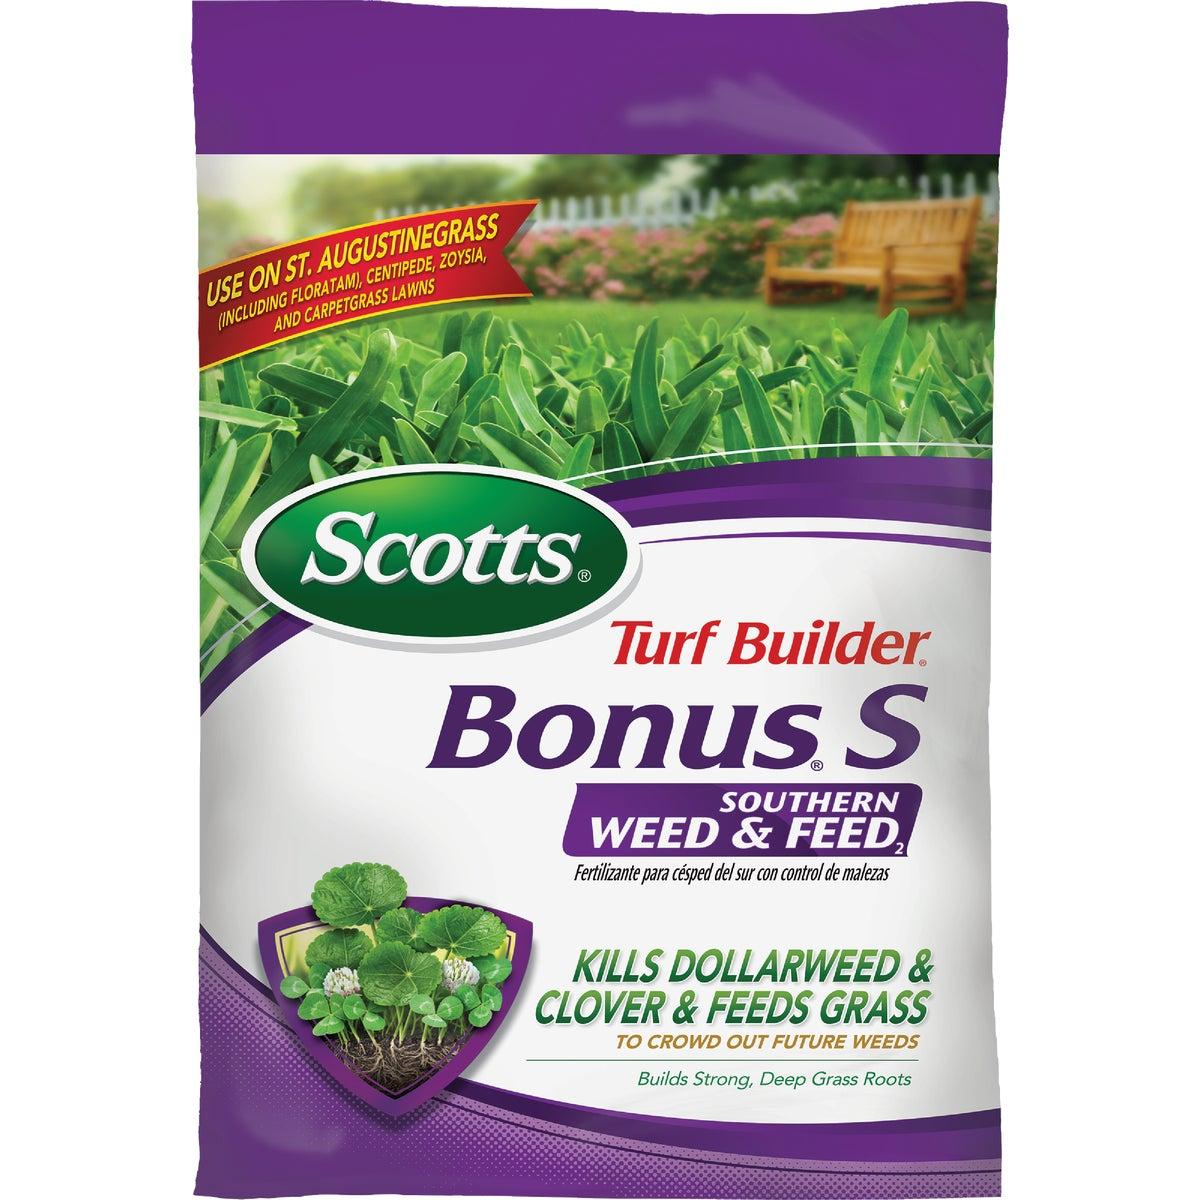 10M TB BONUS S WEED&FEED - 33020 by Scotts Company